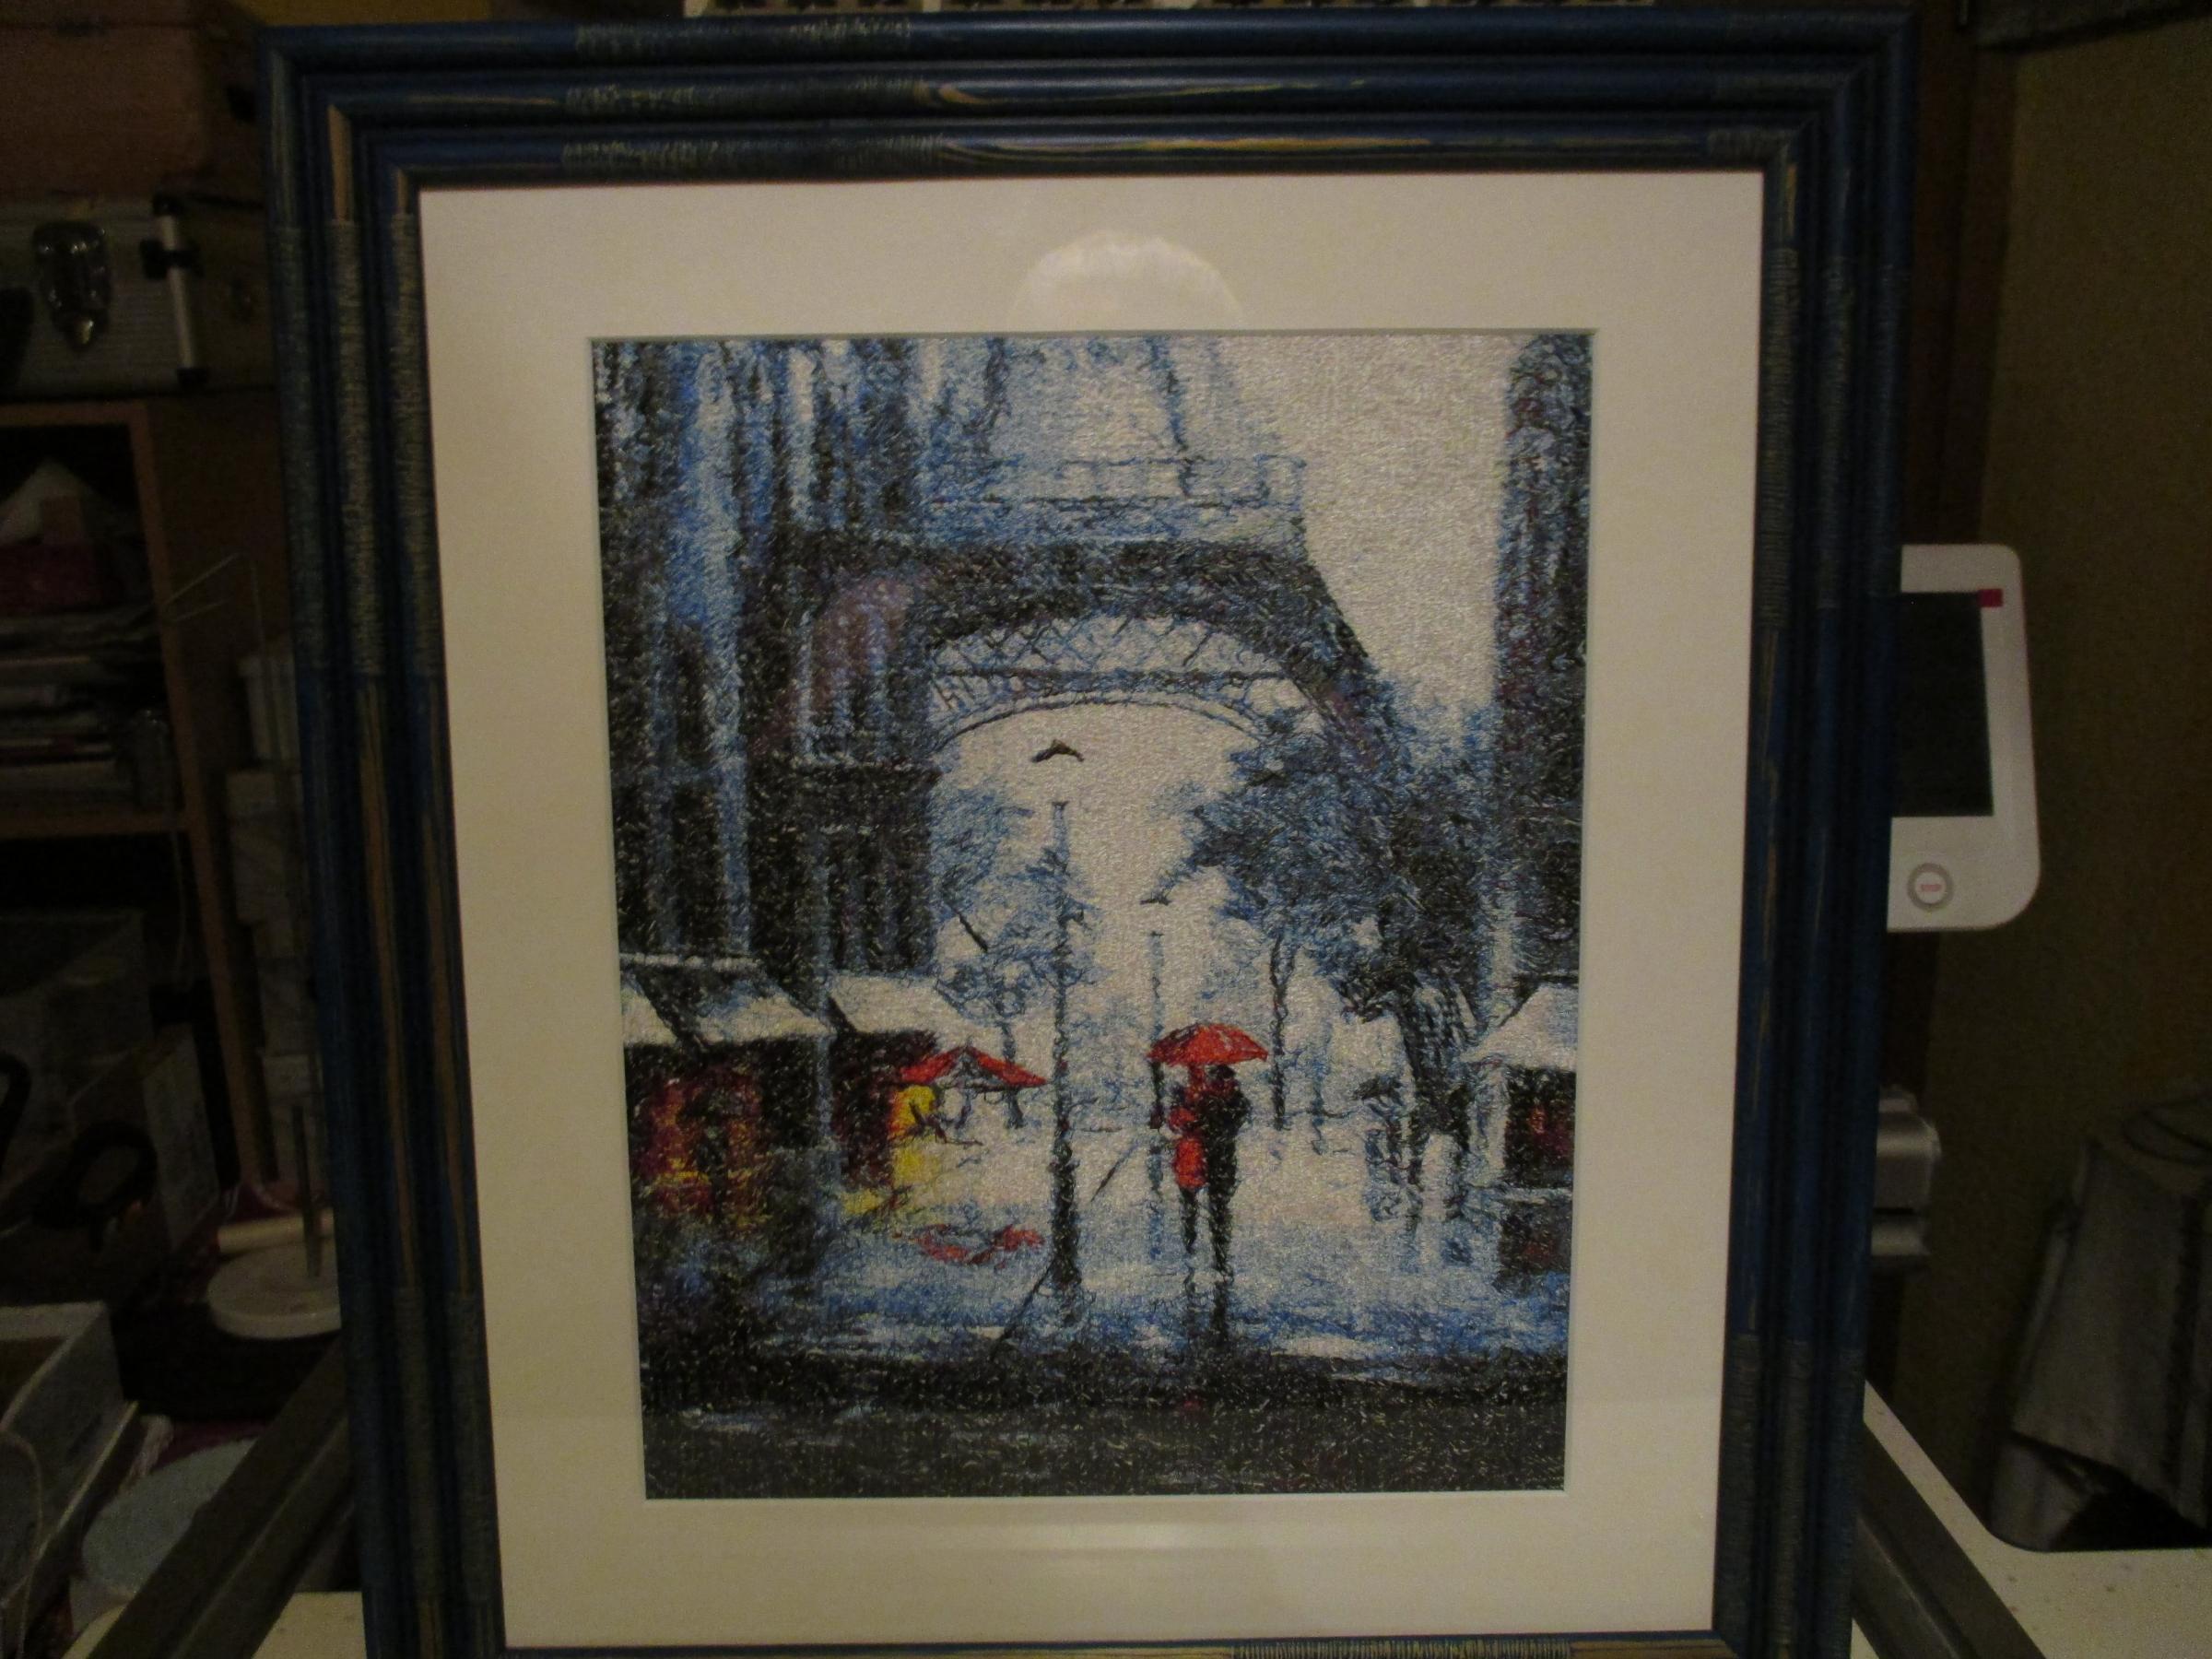 Paris rain photo stitch embroidery design